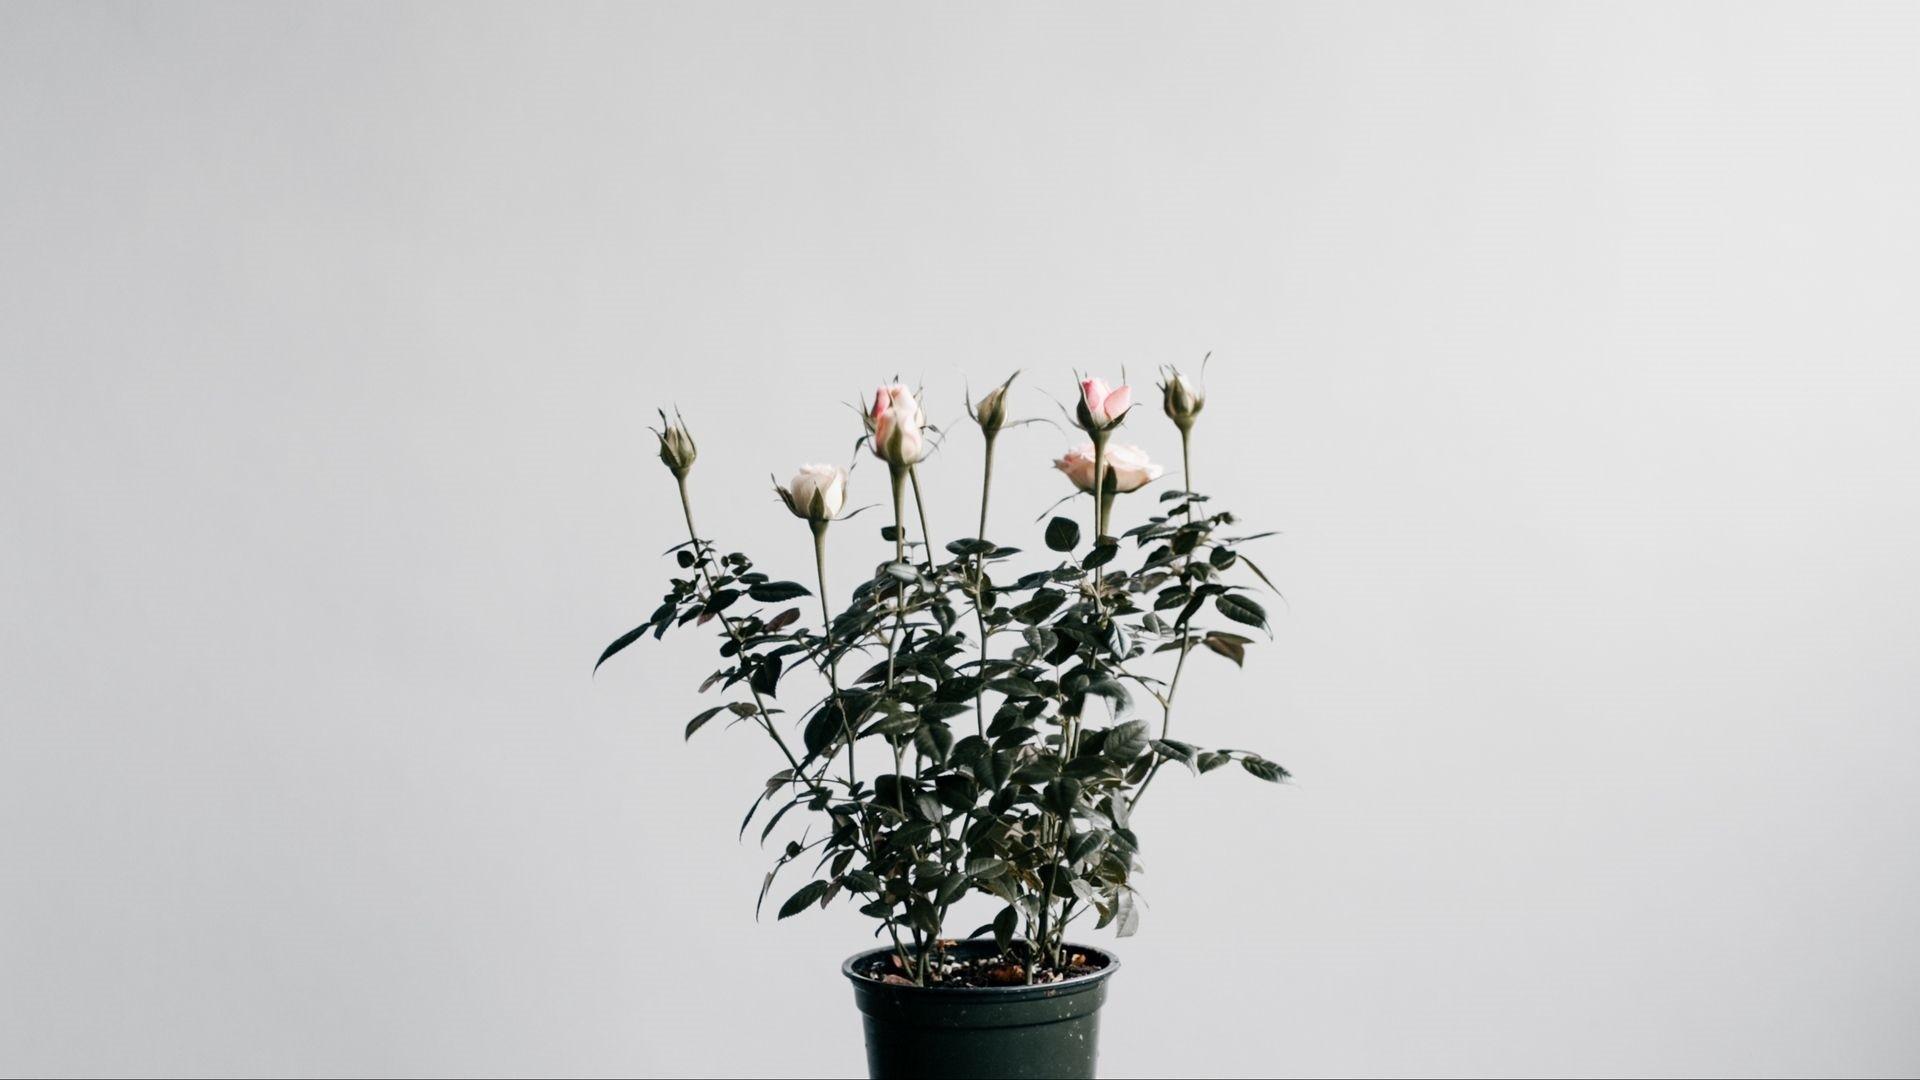 Flower Minimalist wallpaper for computer